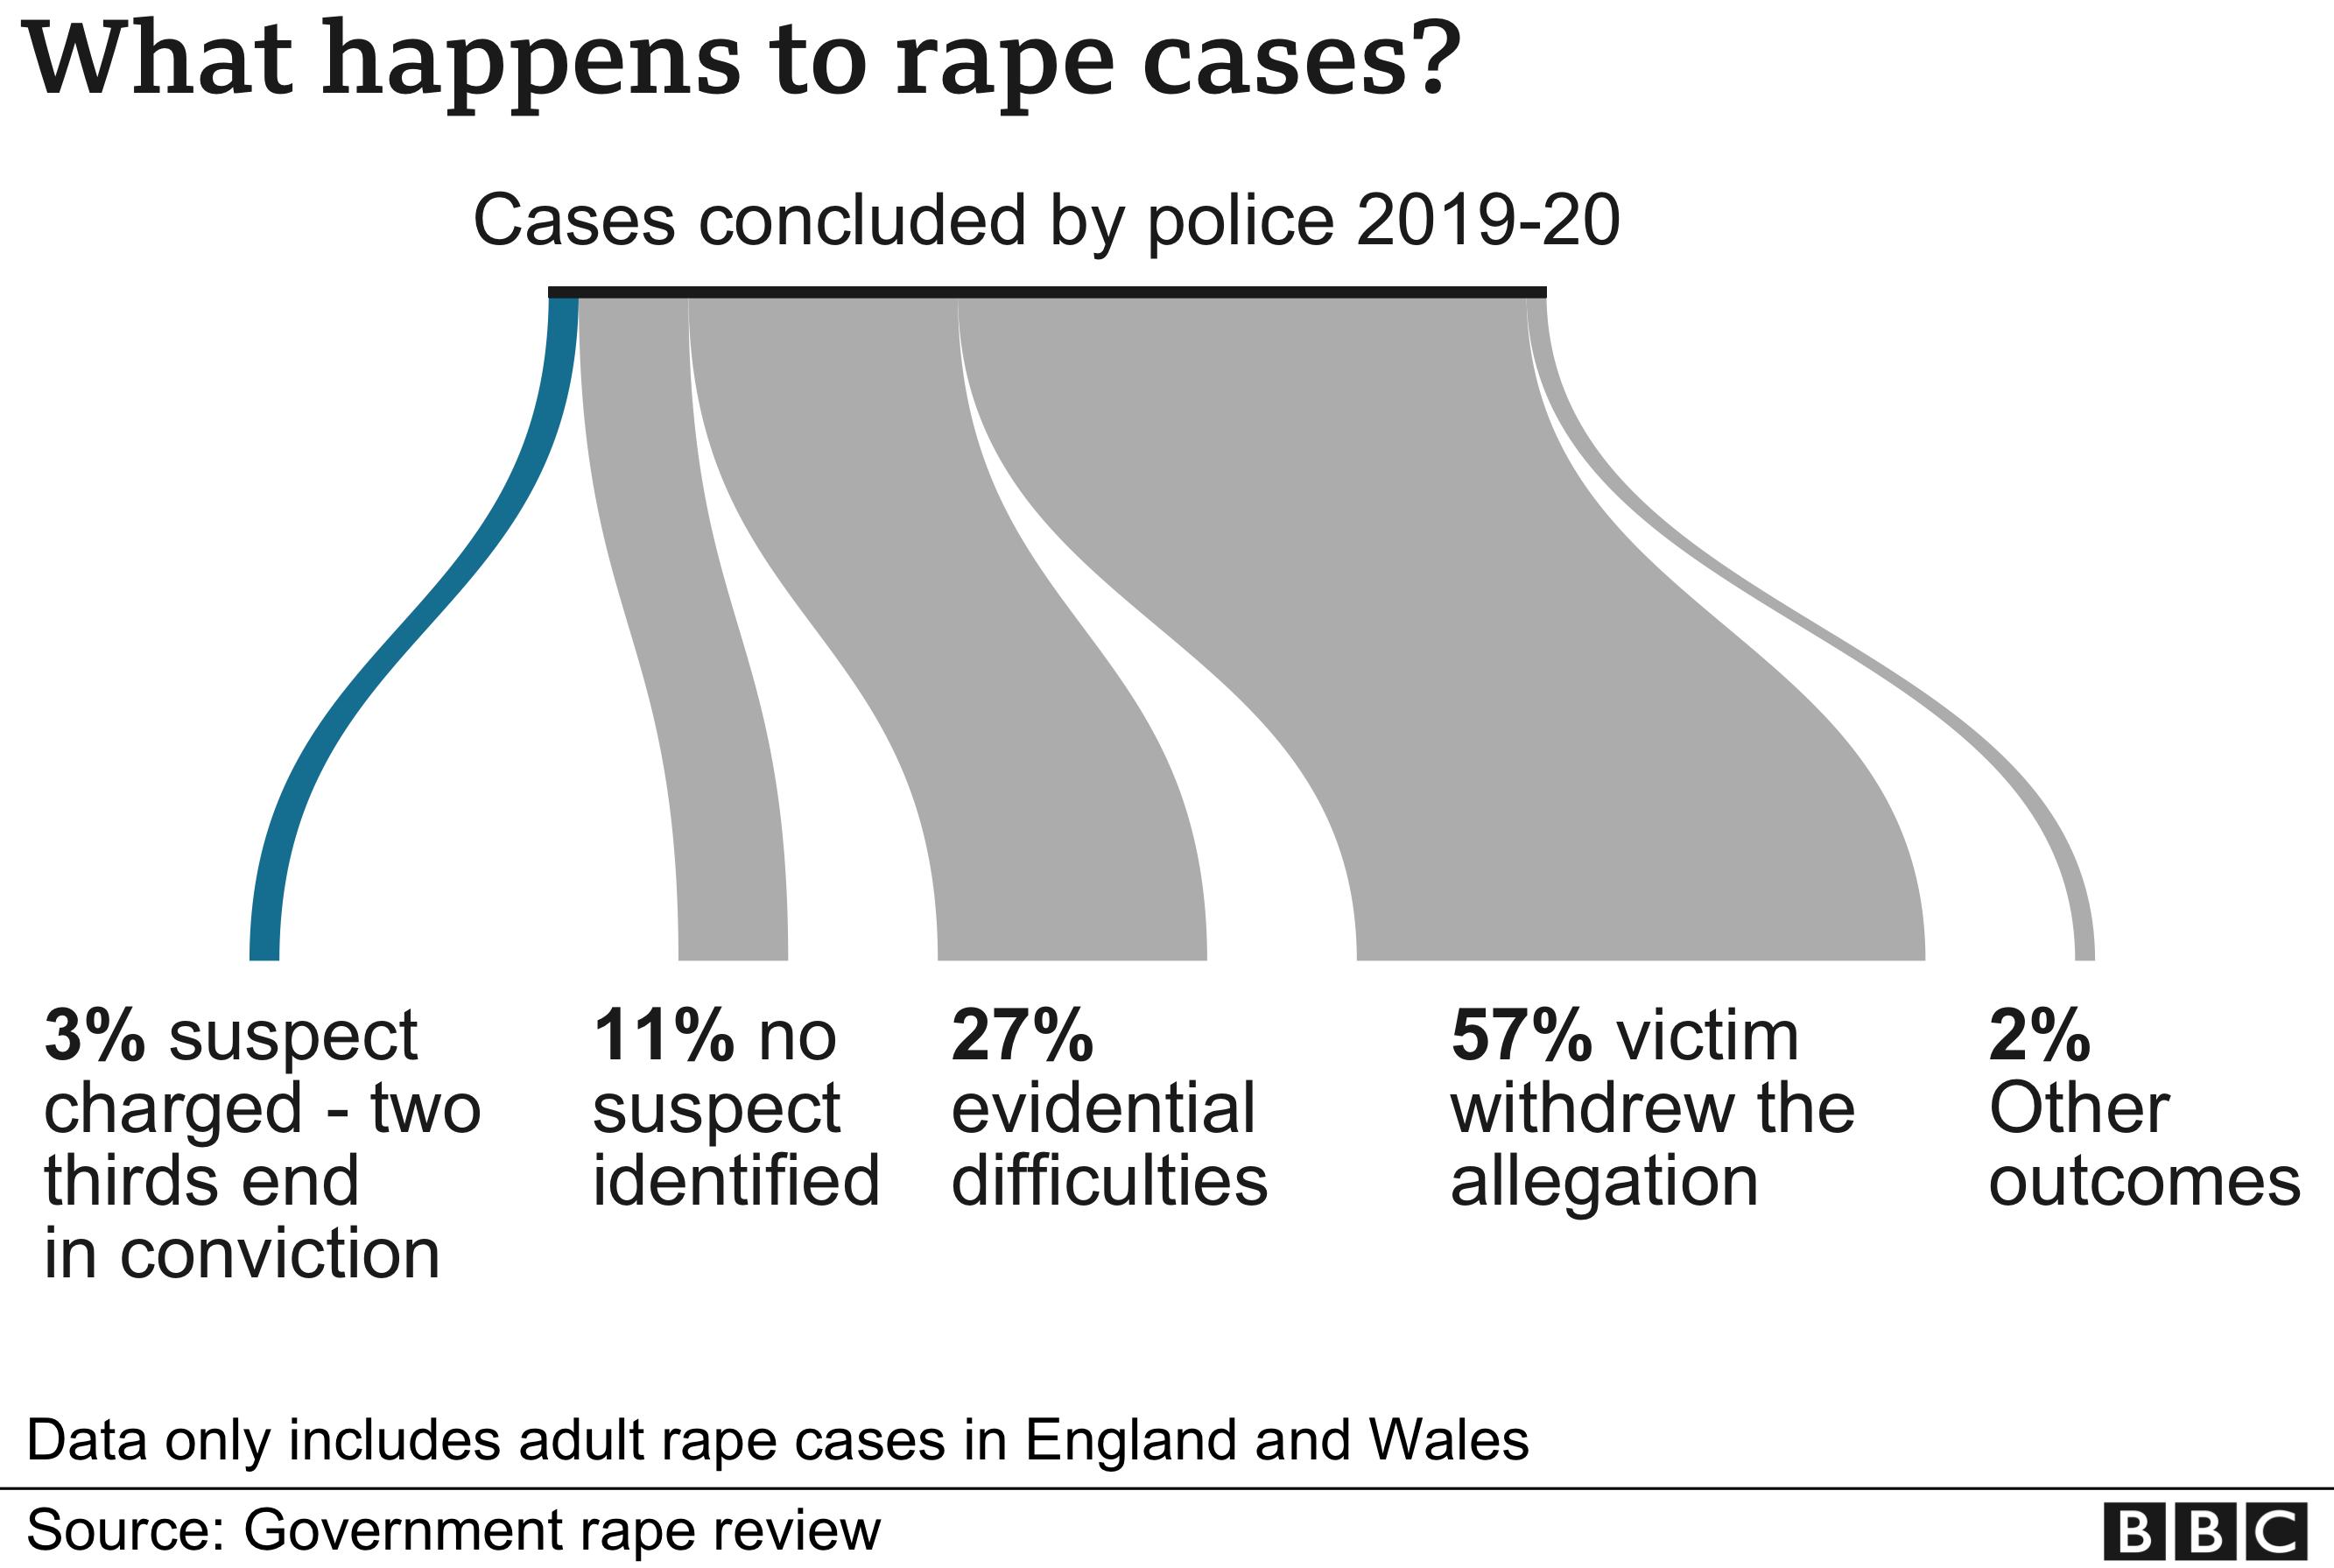 Graphic showing rape case outcomes